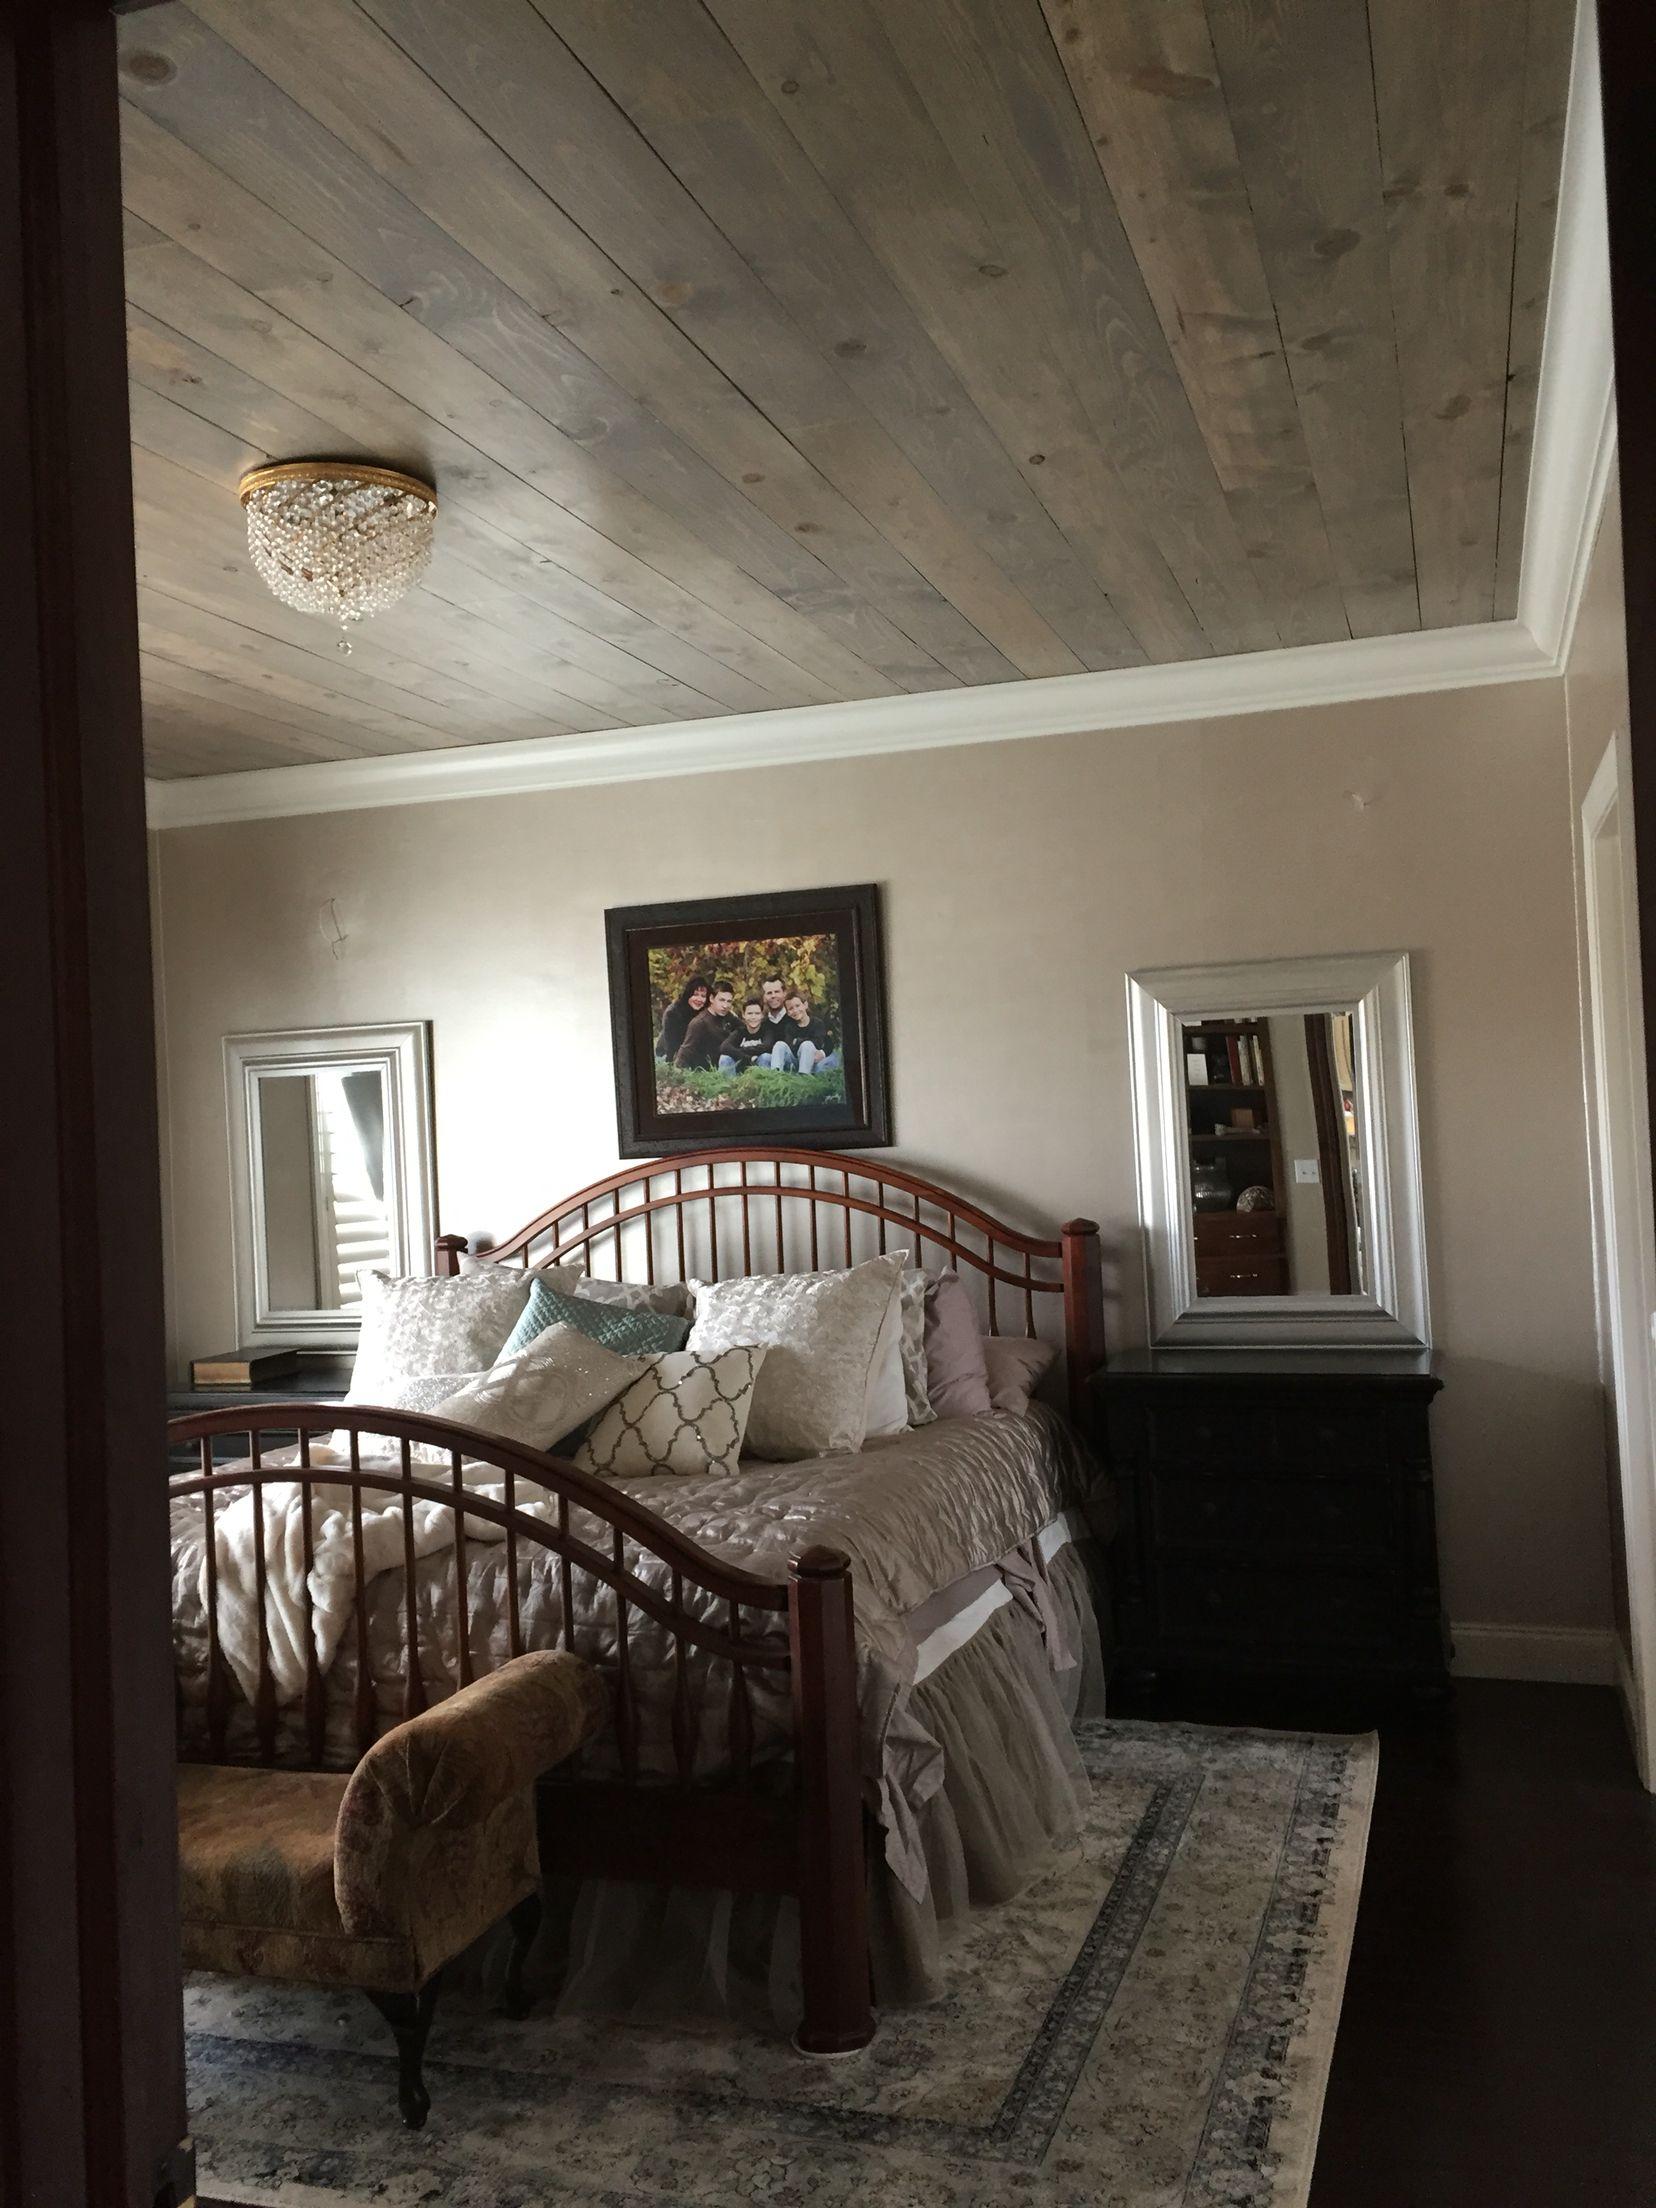 Uneek Design custom ceiling work in Maple Grove Mn giving ...